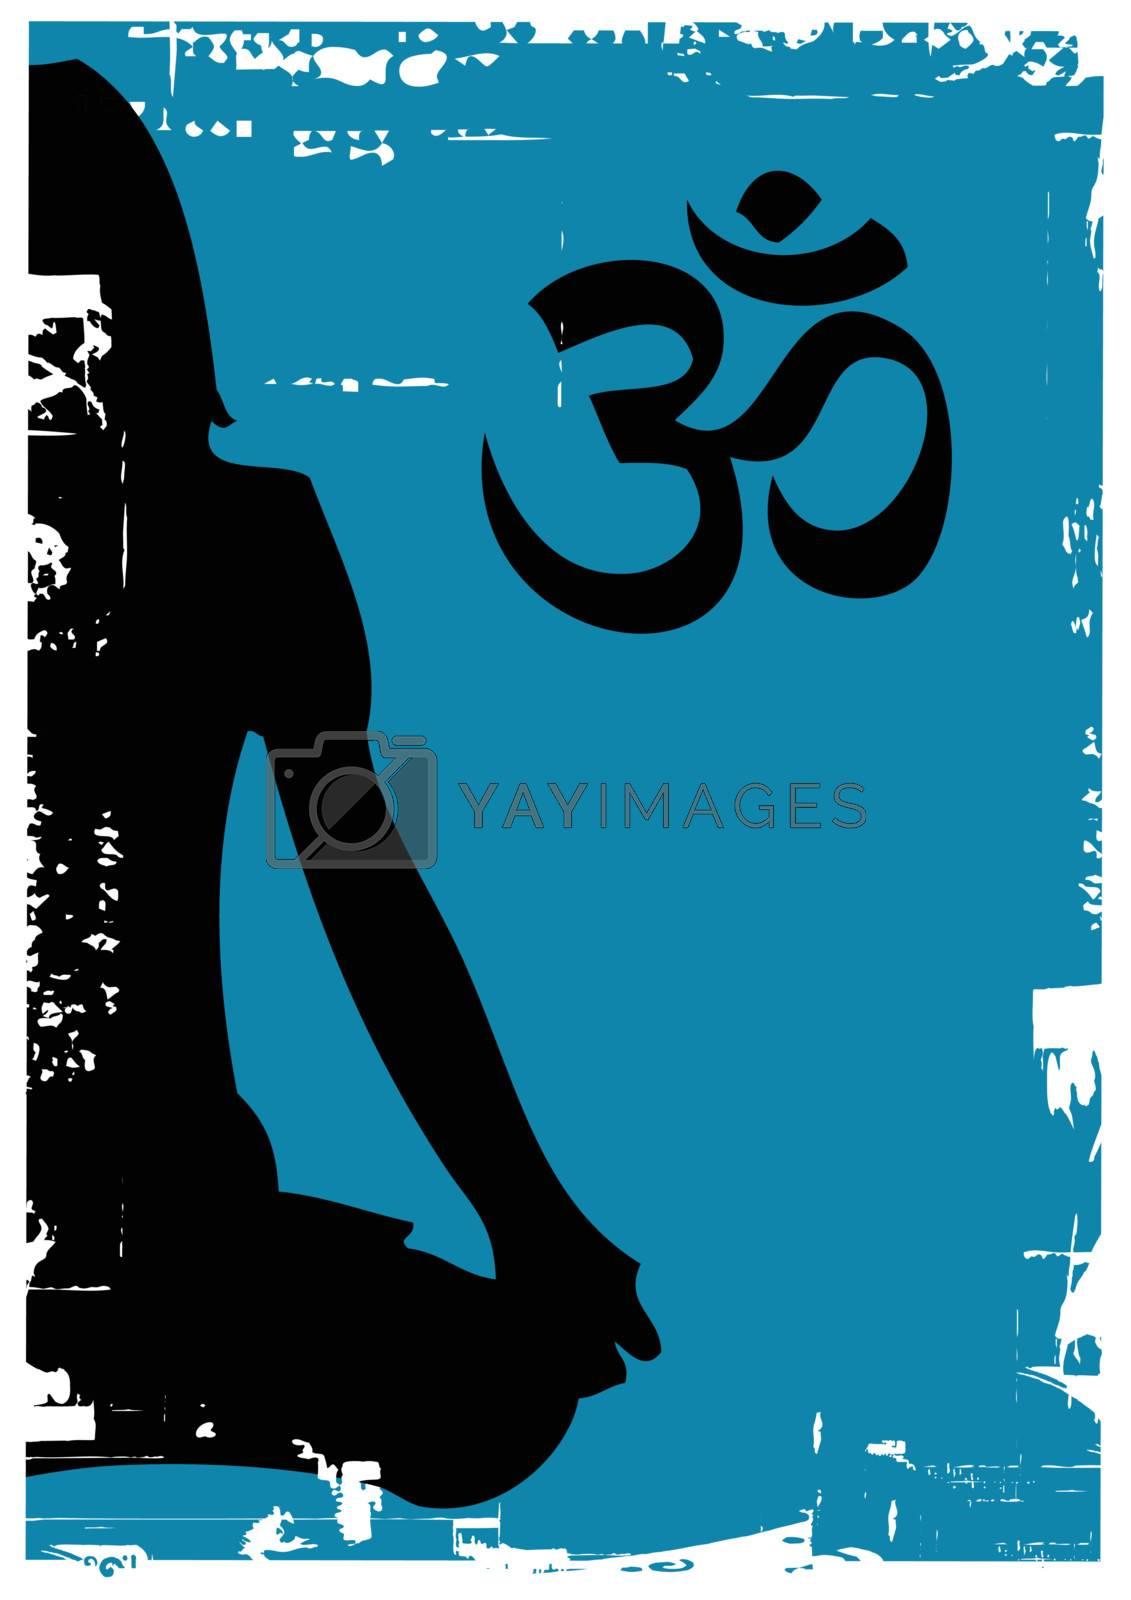 Royalty free image of yogi by emirsimsek